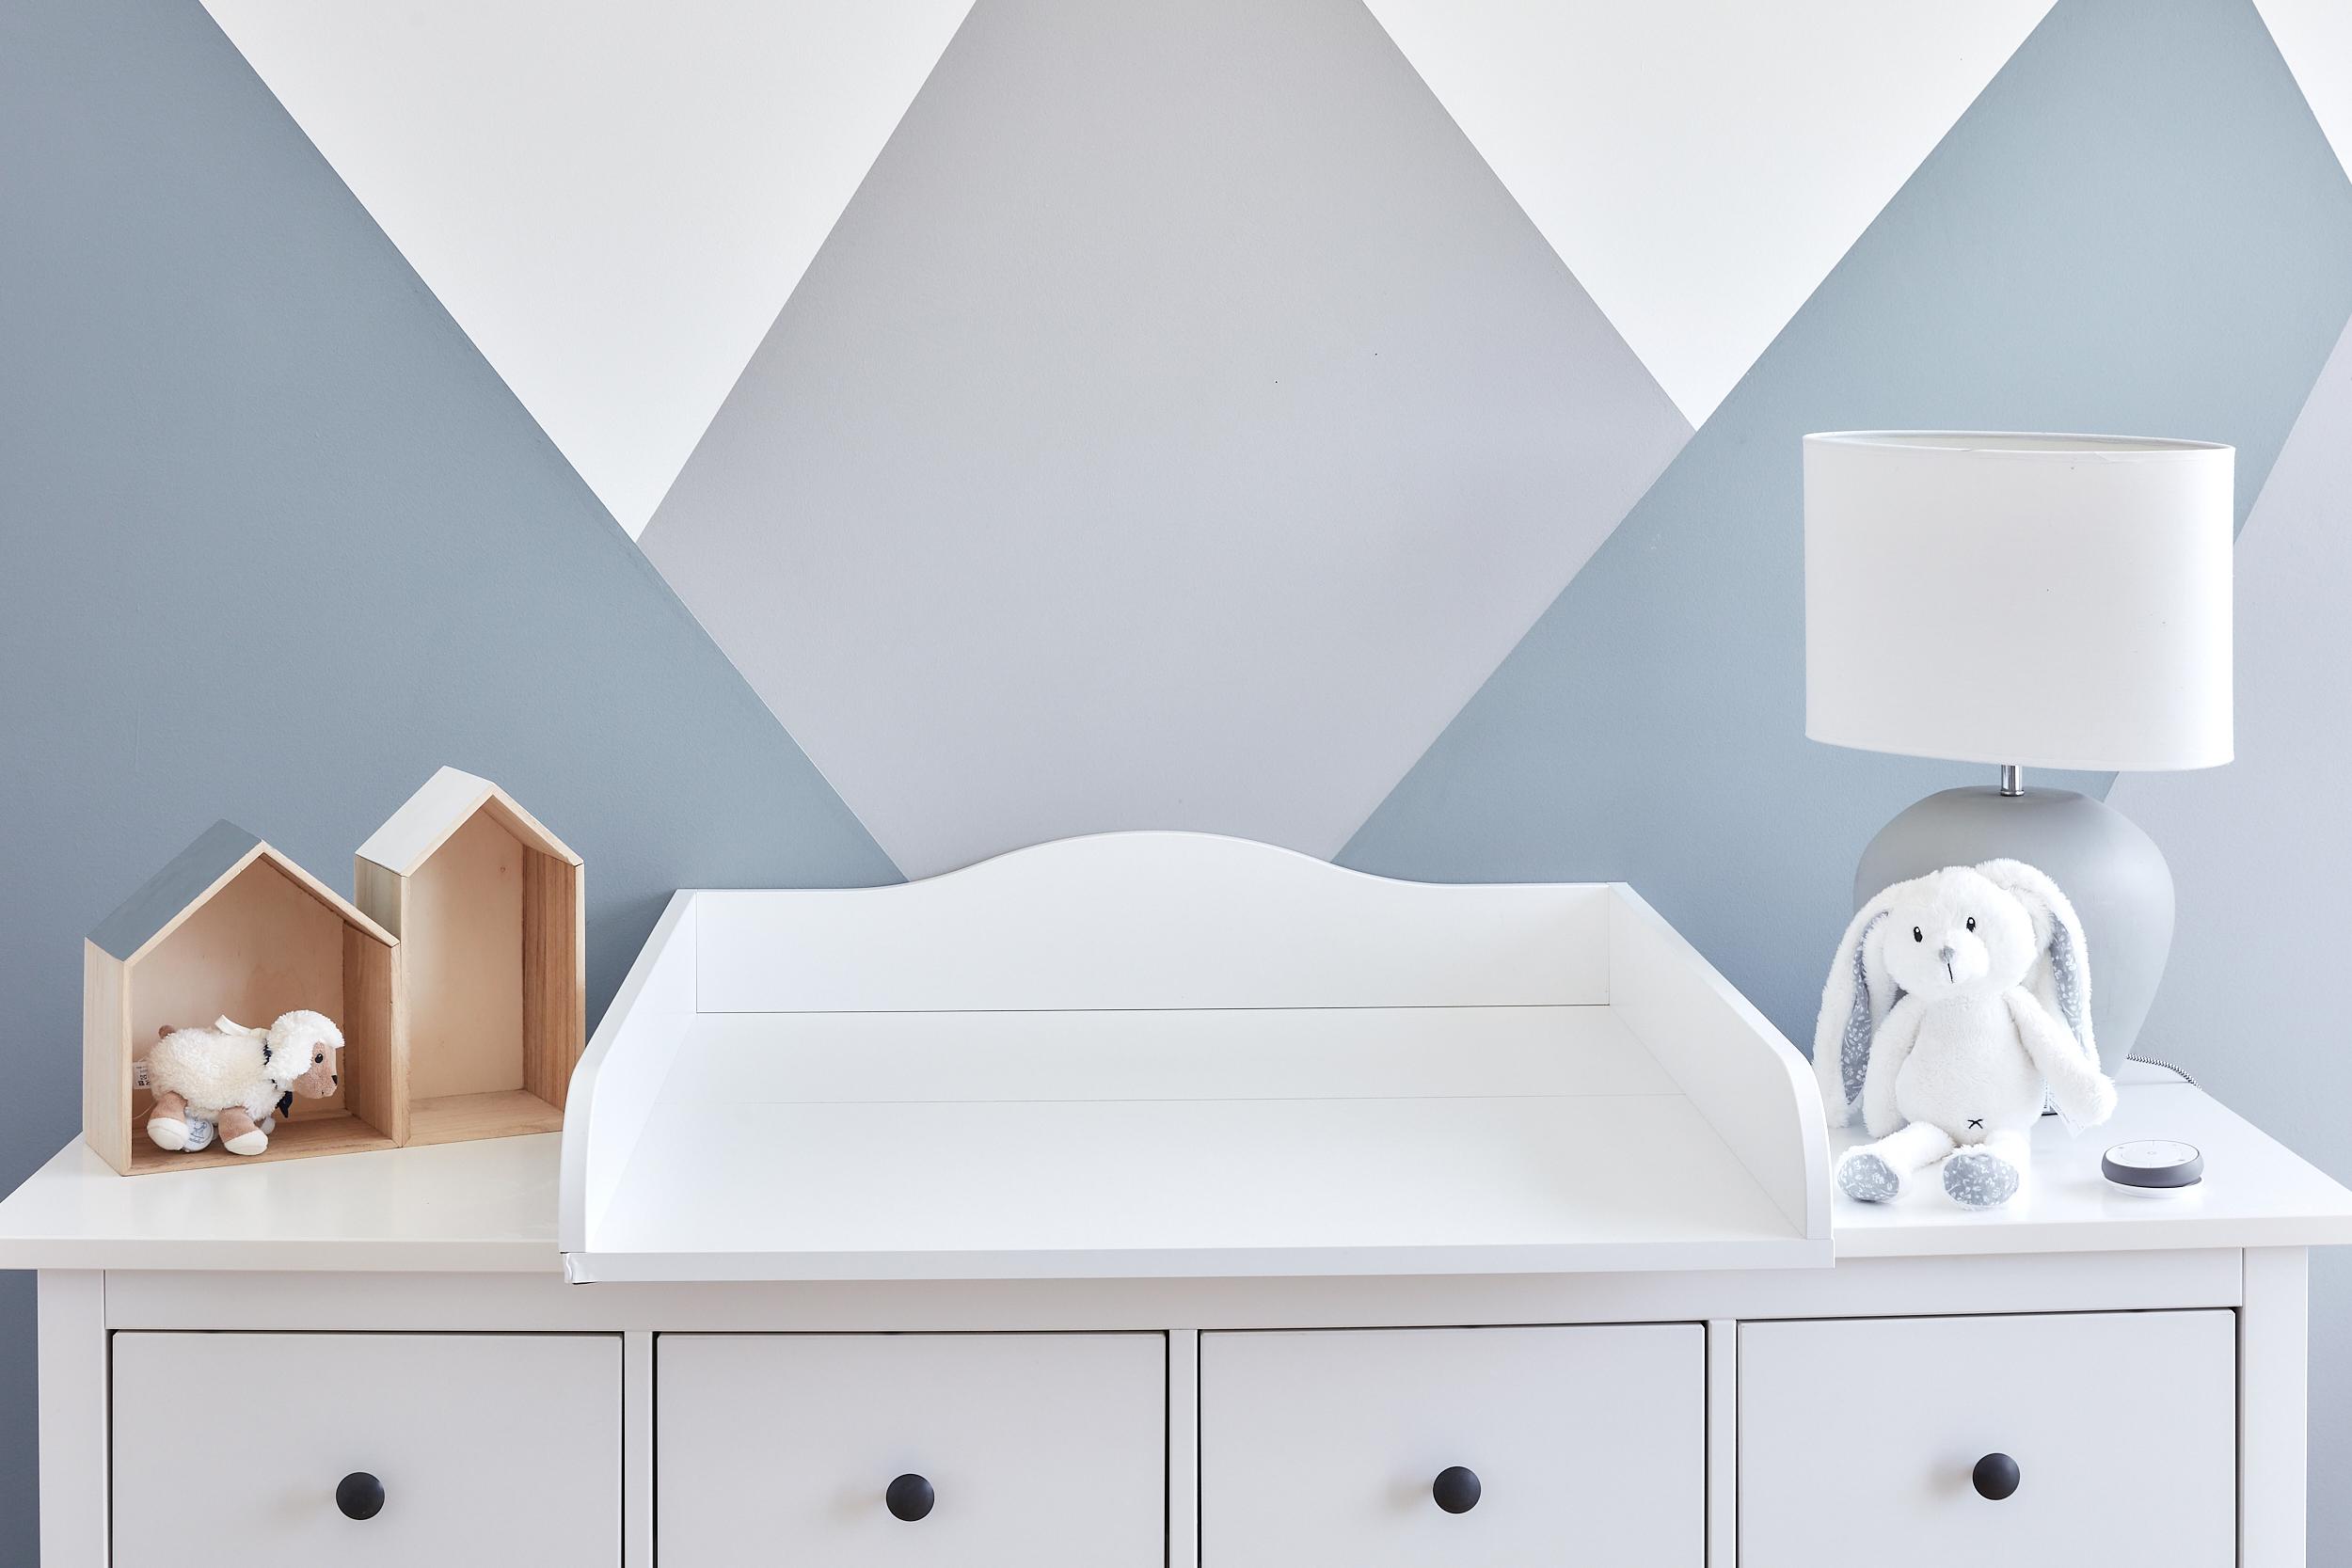 kraftkids wickelaufsatz universal. Black Bedroom Furniture Sets. Home Design Ideas